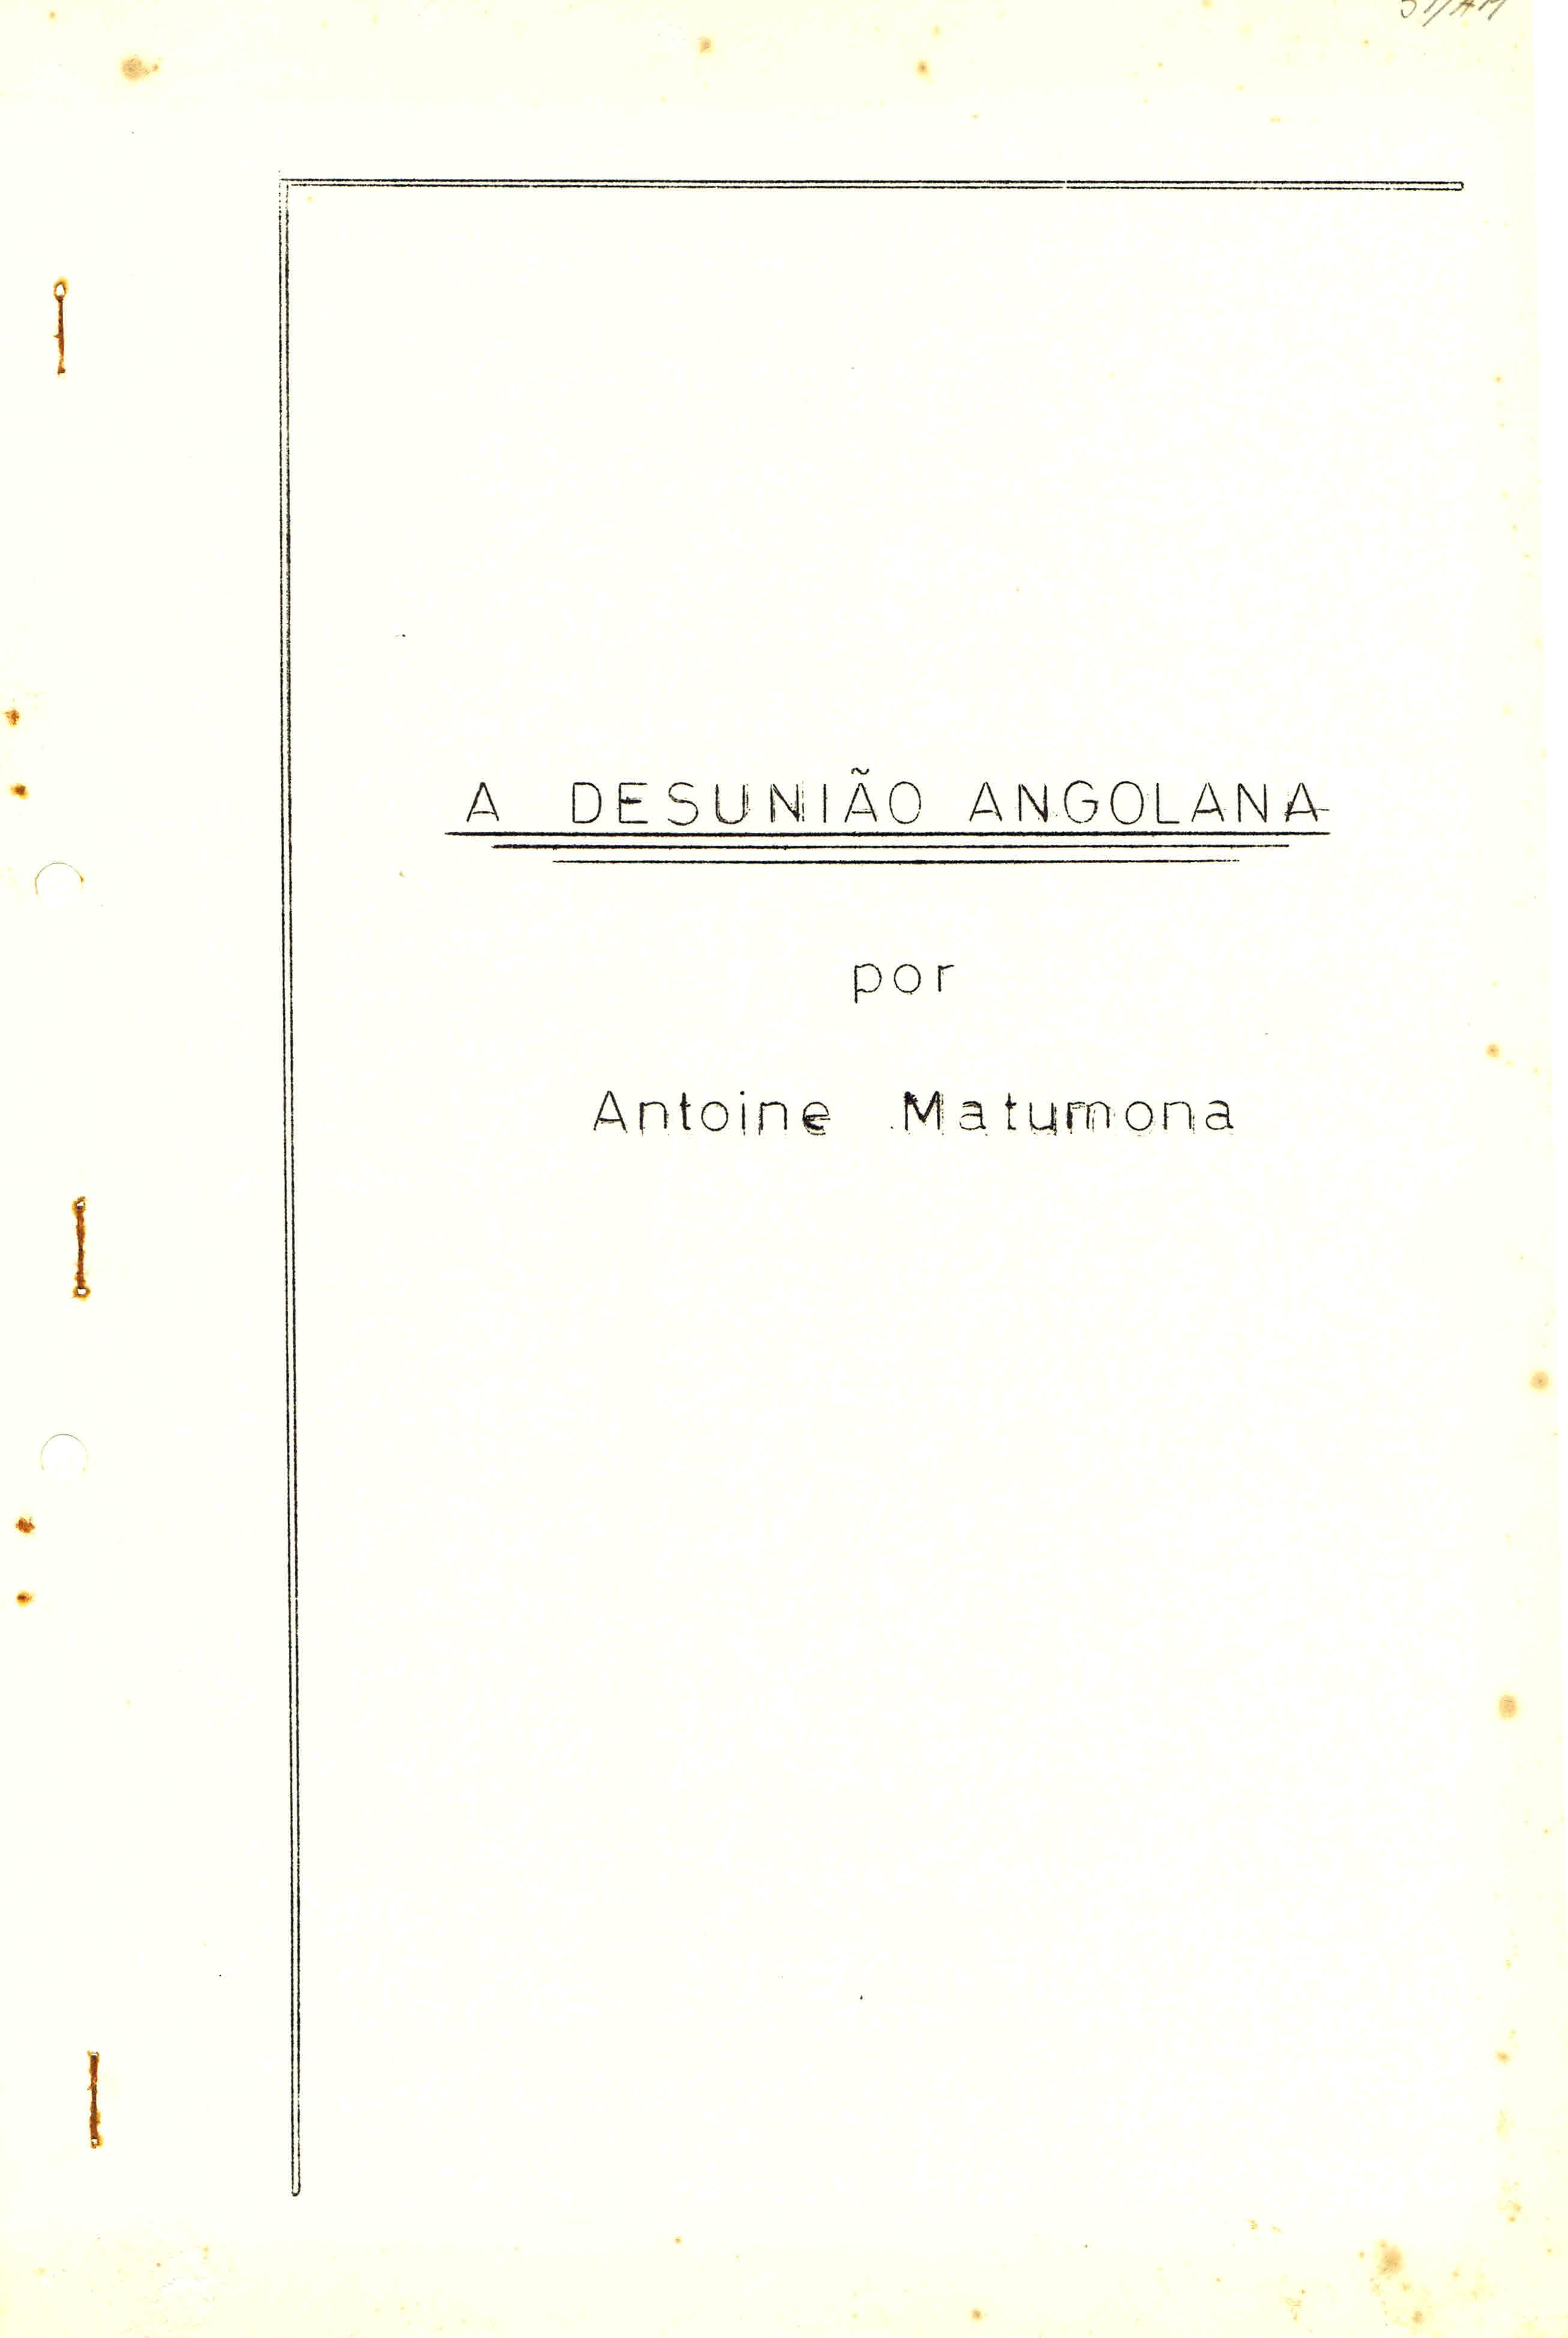 Copy of Document (10)